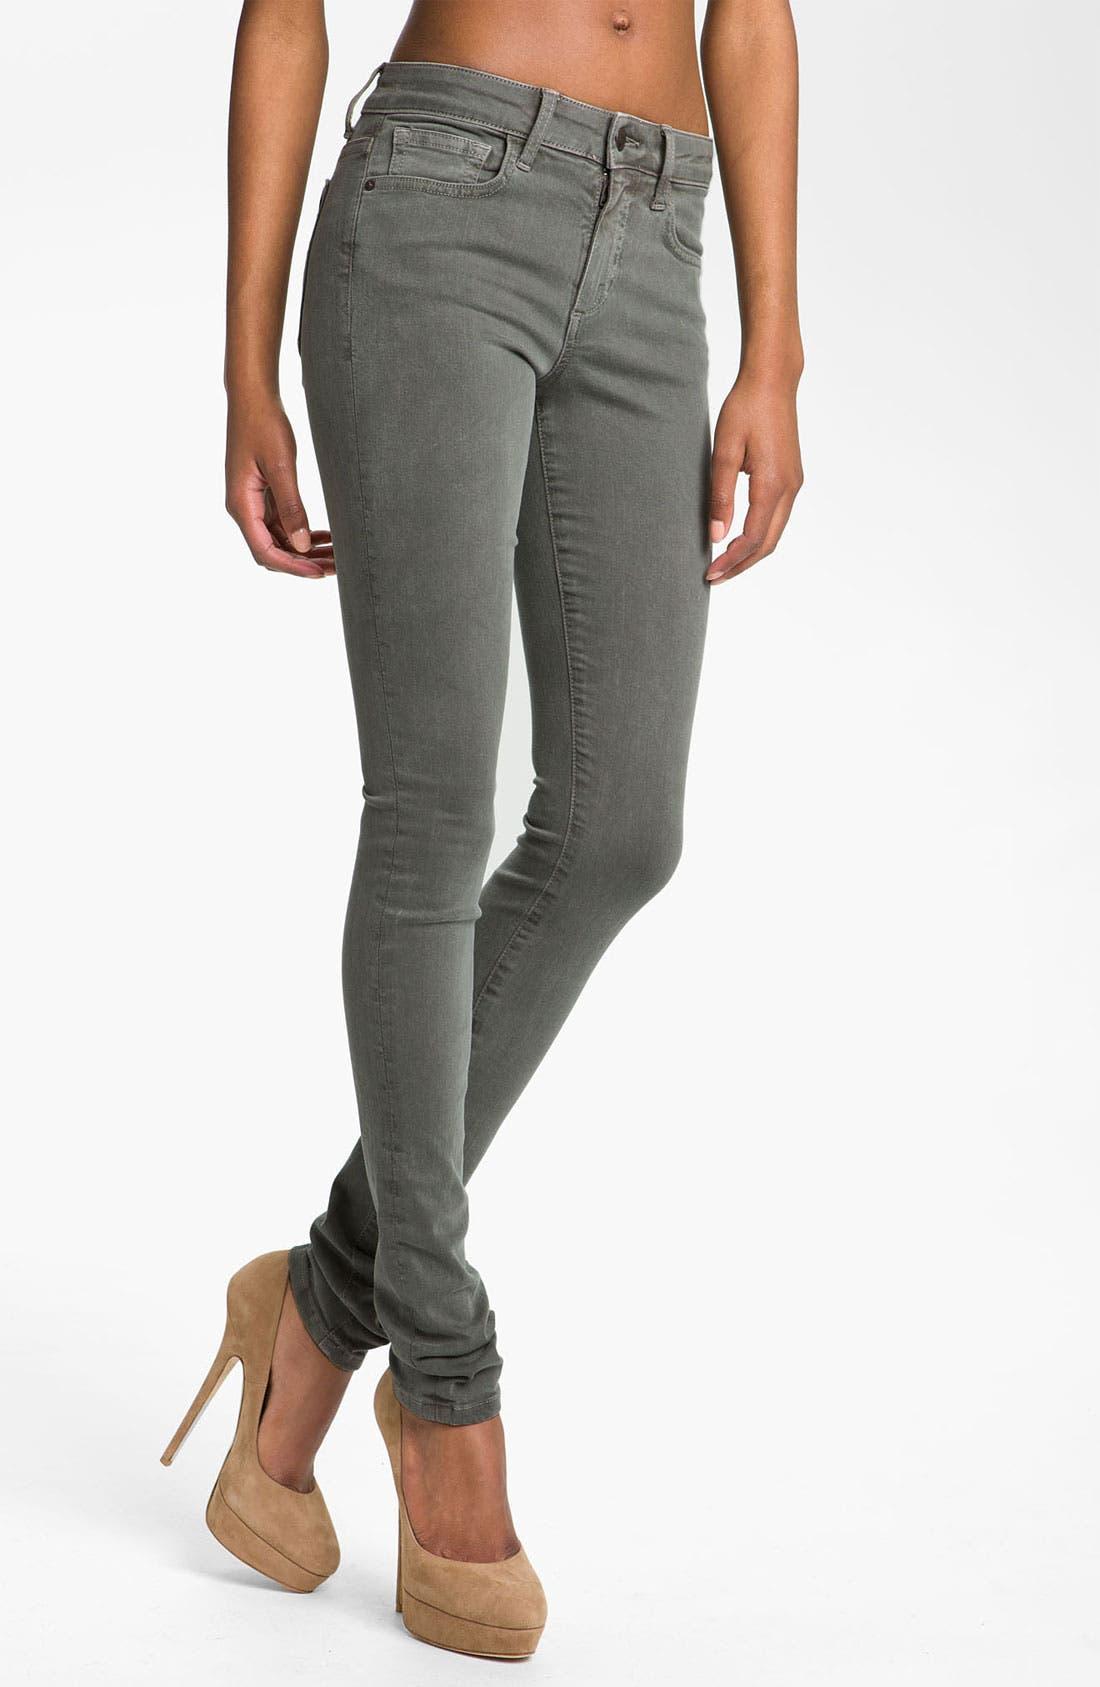 Alternate Image 1 Selected - Joe's Skinny Stretch Denim Jeans (Bay Leaf)